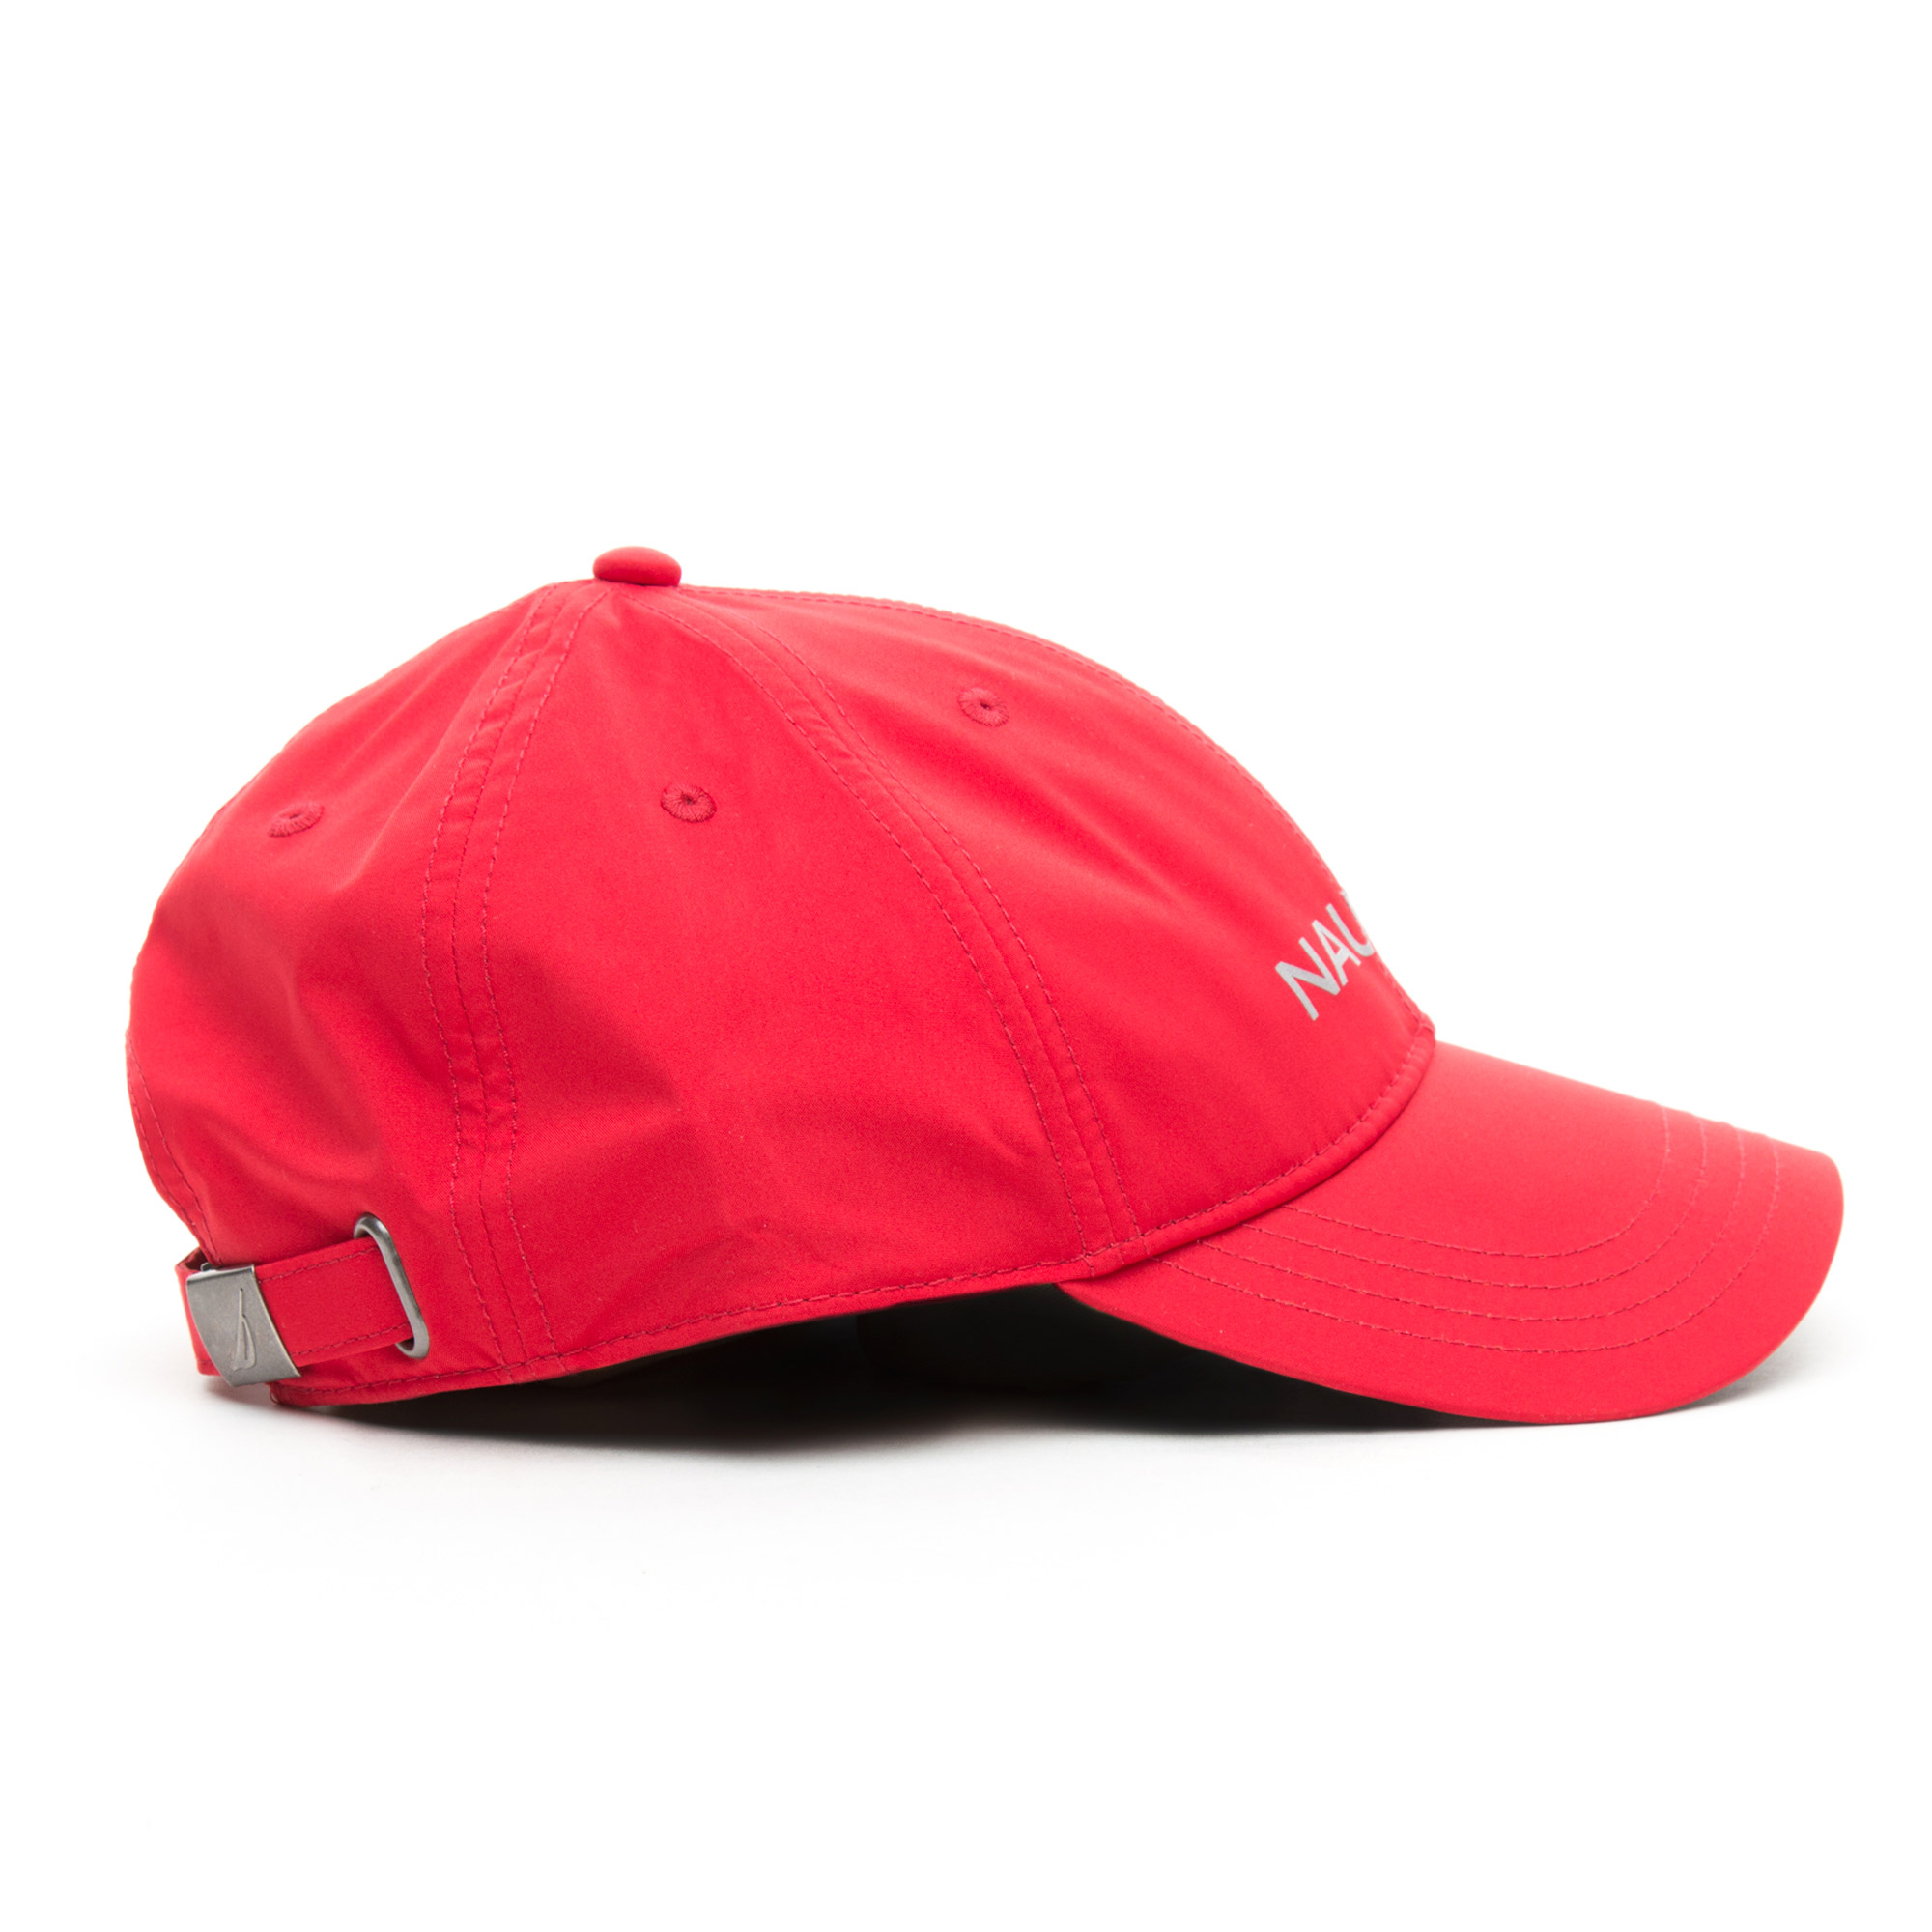 Nautica Erkek Kırmızı Şapka